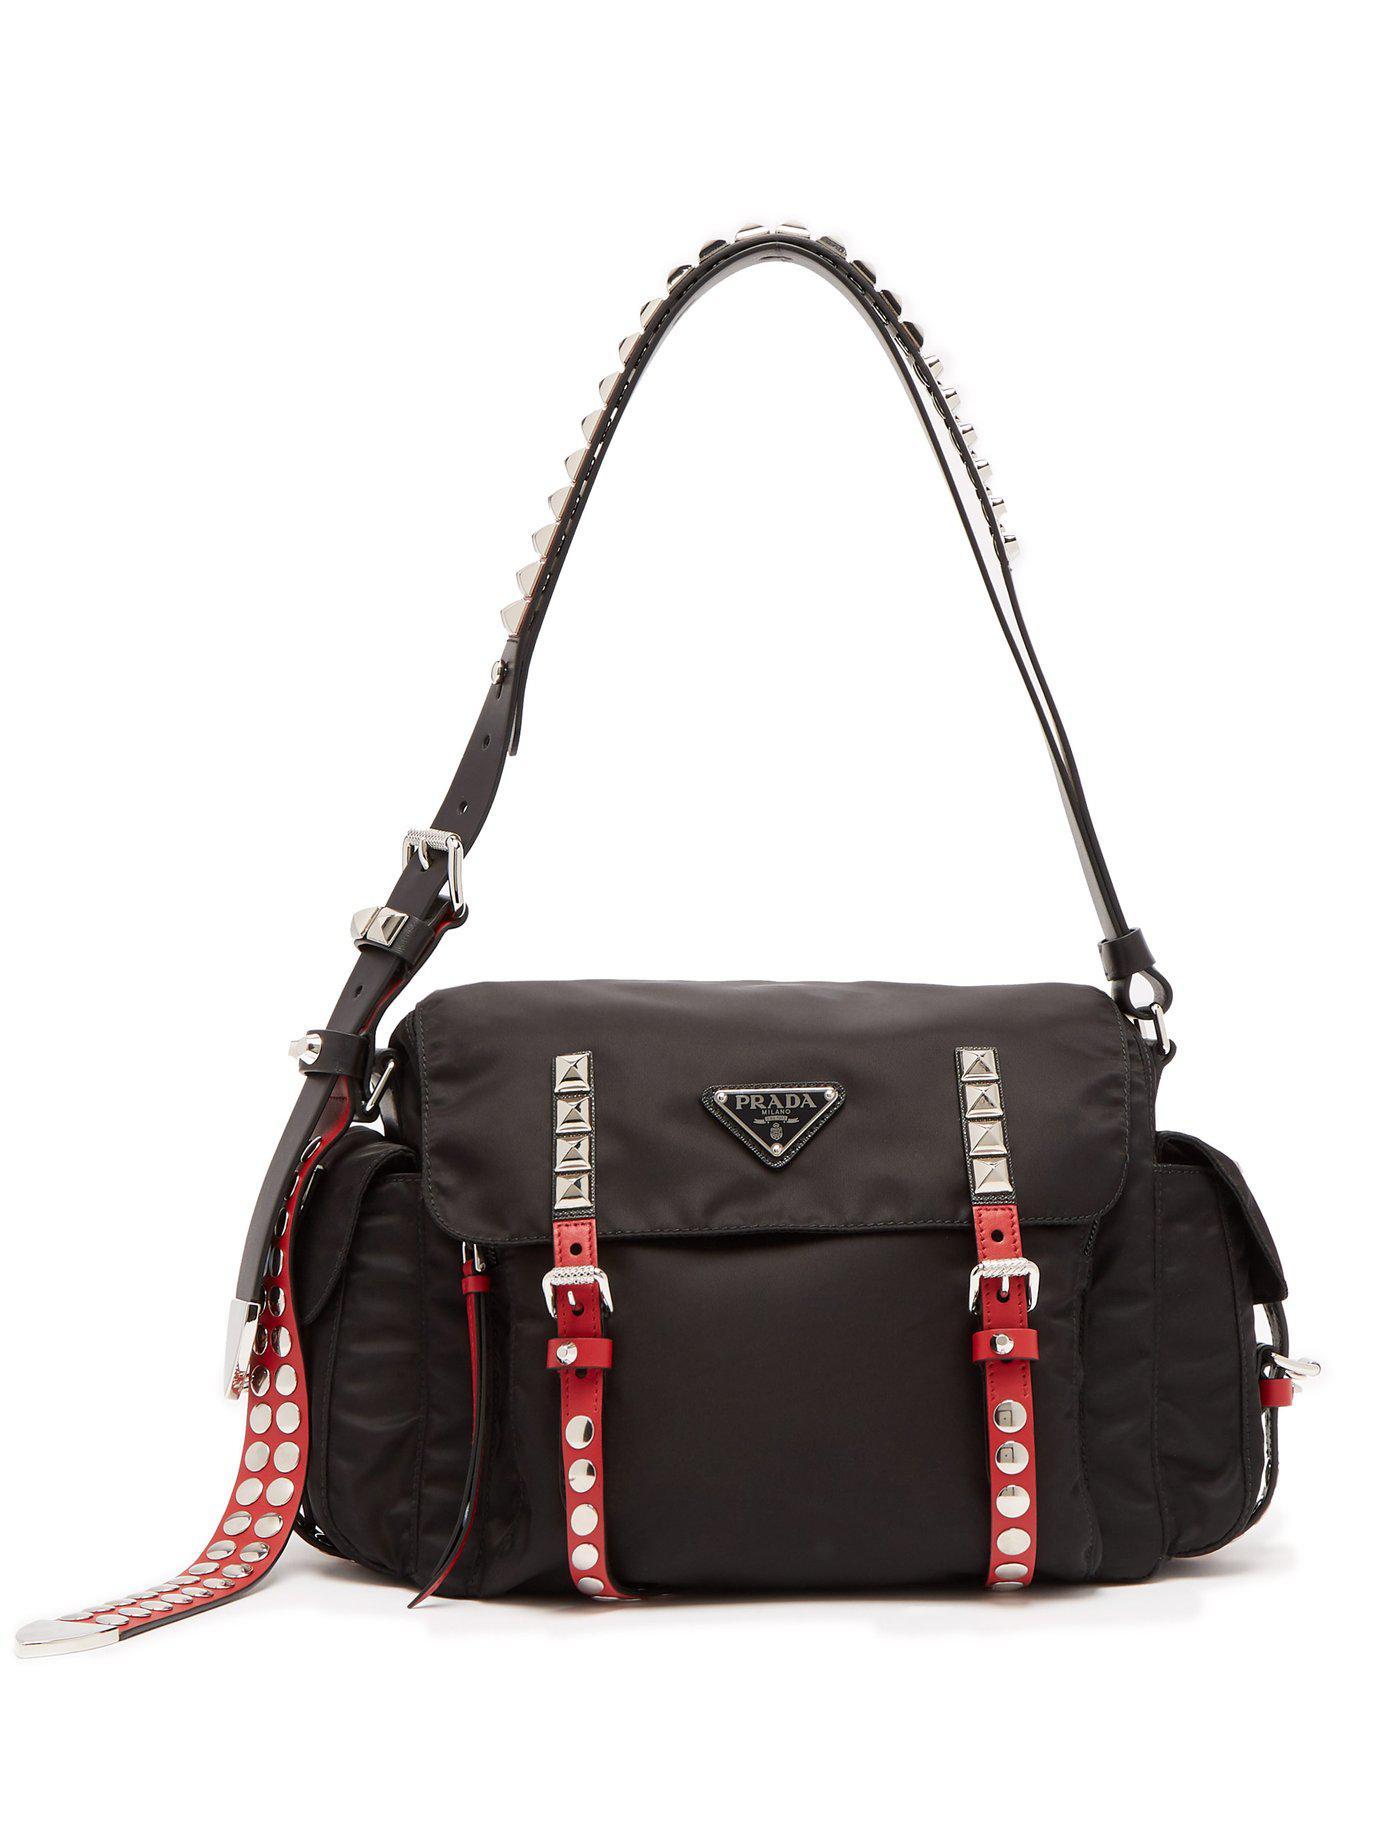 d8a48280b6f7 Prada Vela Leather Trimmed Cross Body Bag in Black - Lyst